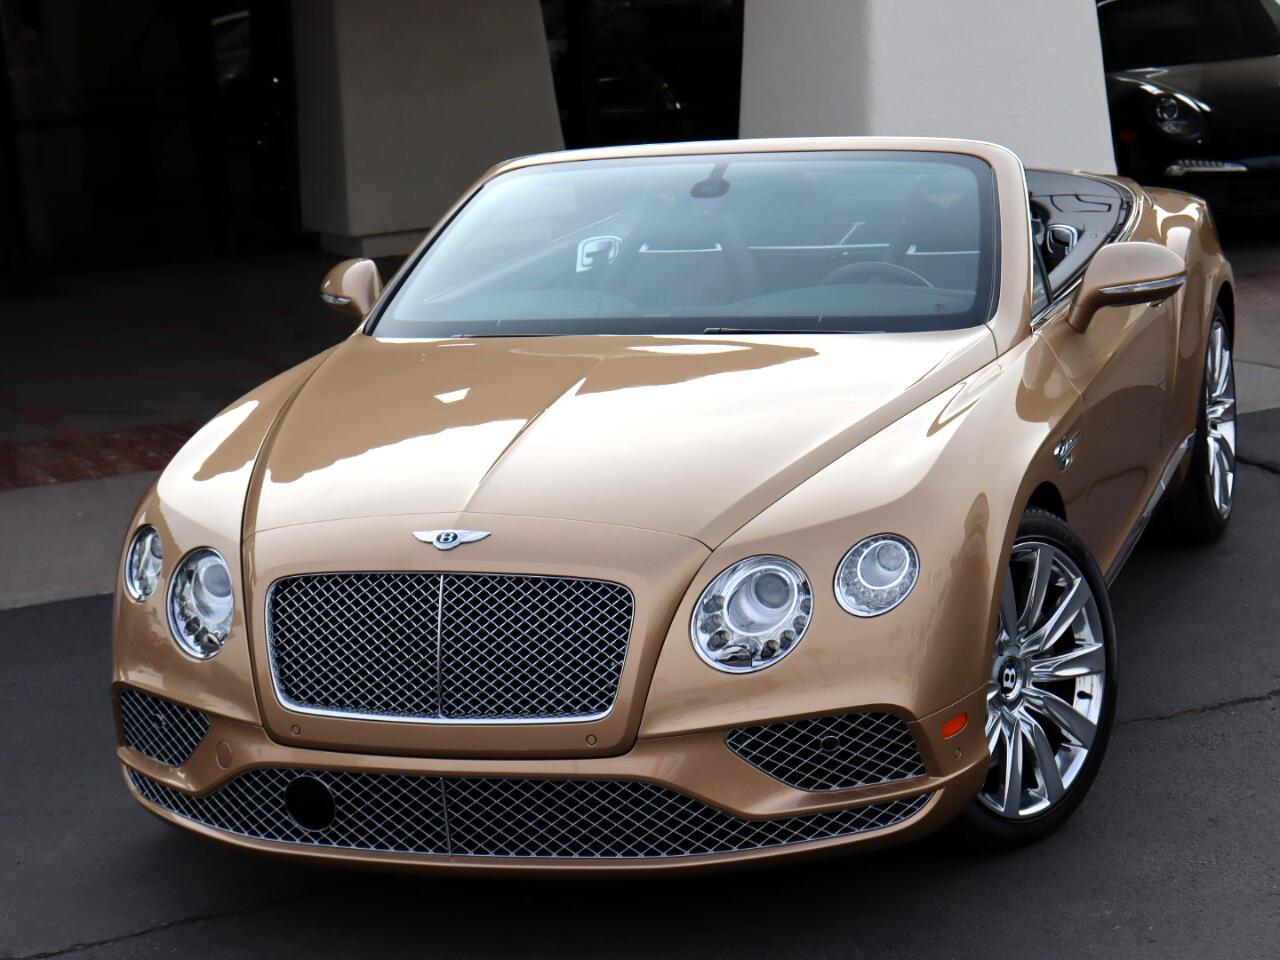 Bentley Continental GTC Convertible 2016